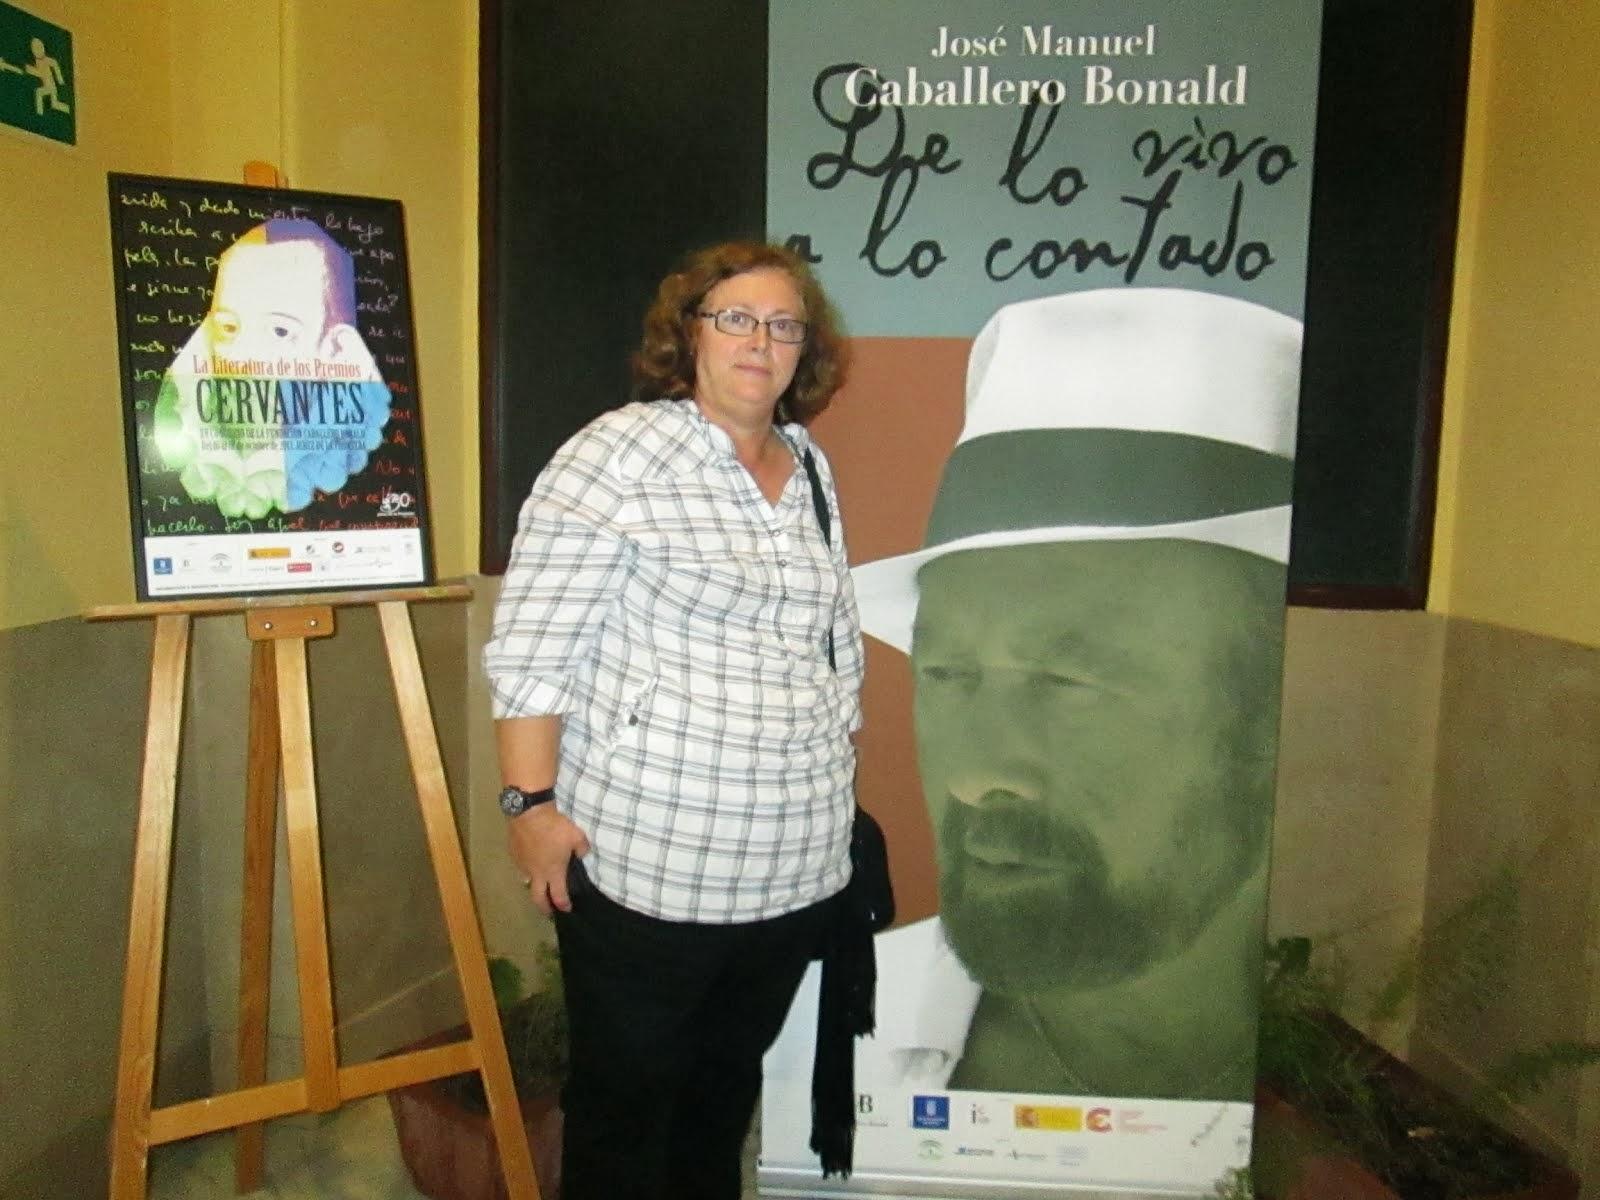 XV C. Caballero Bonald, Premios Cervantes, 2013